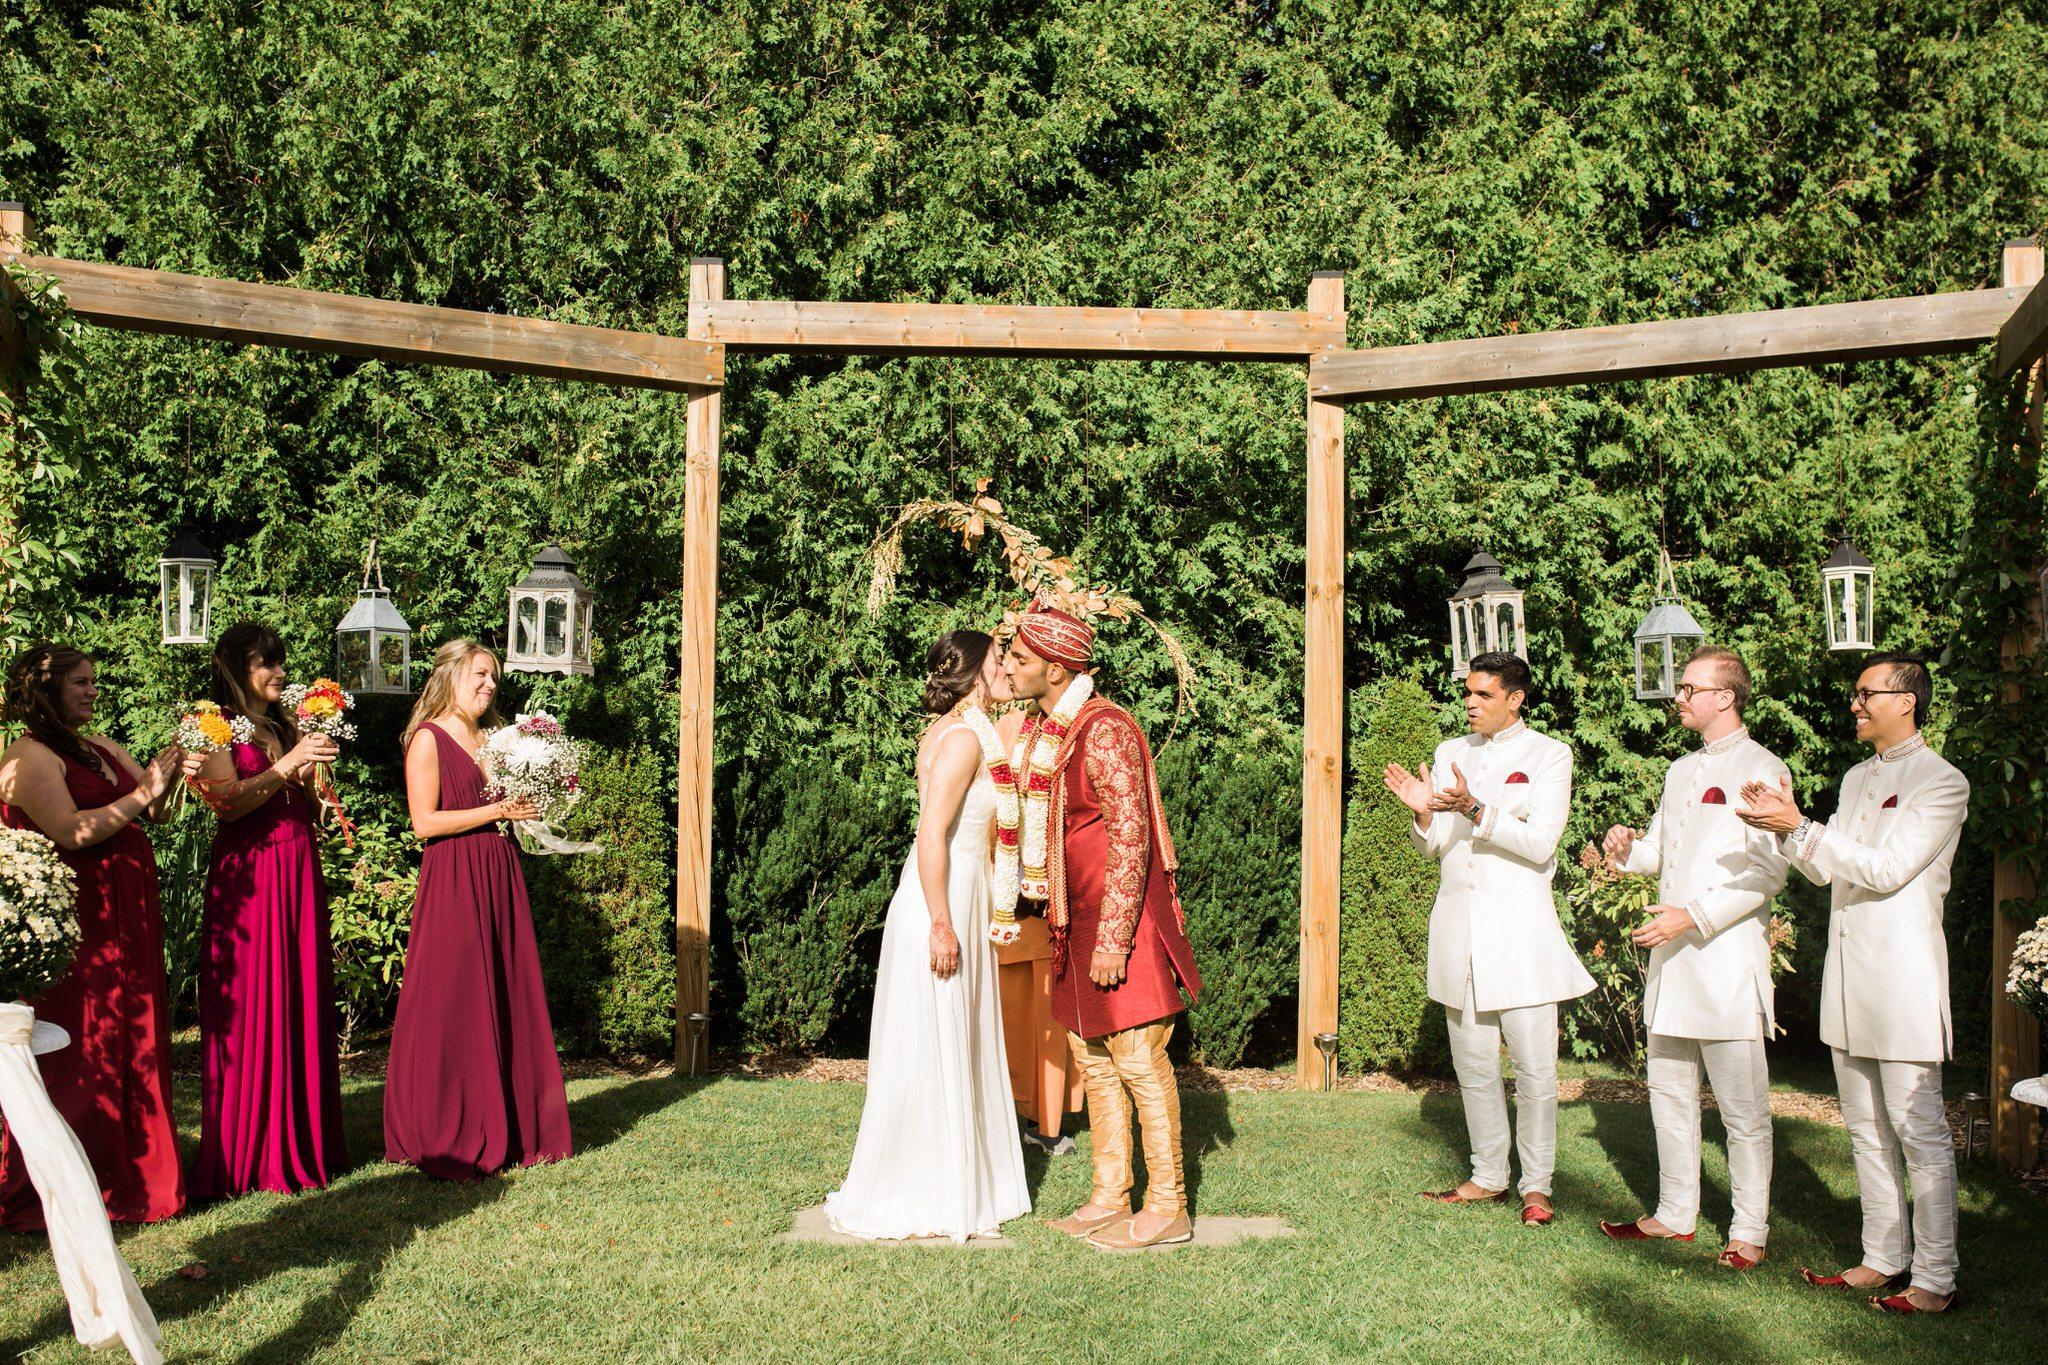 Northview Gardens Wedding - newlyweds kiss